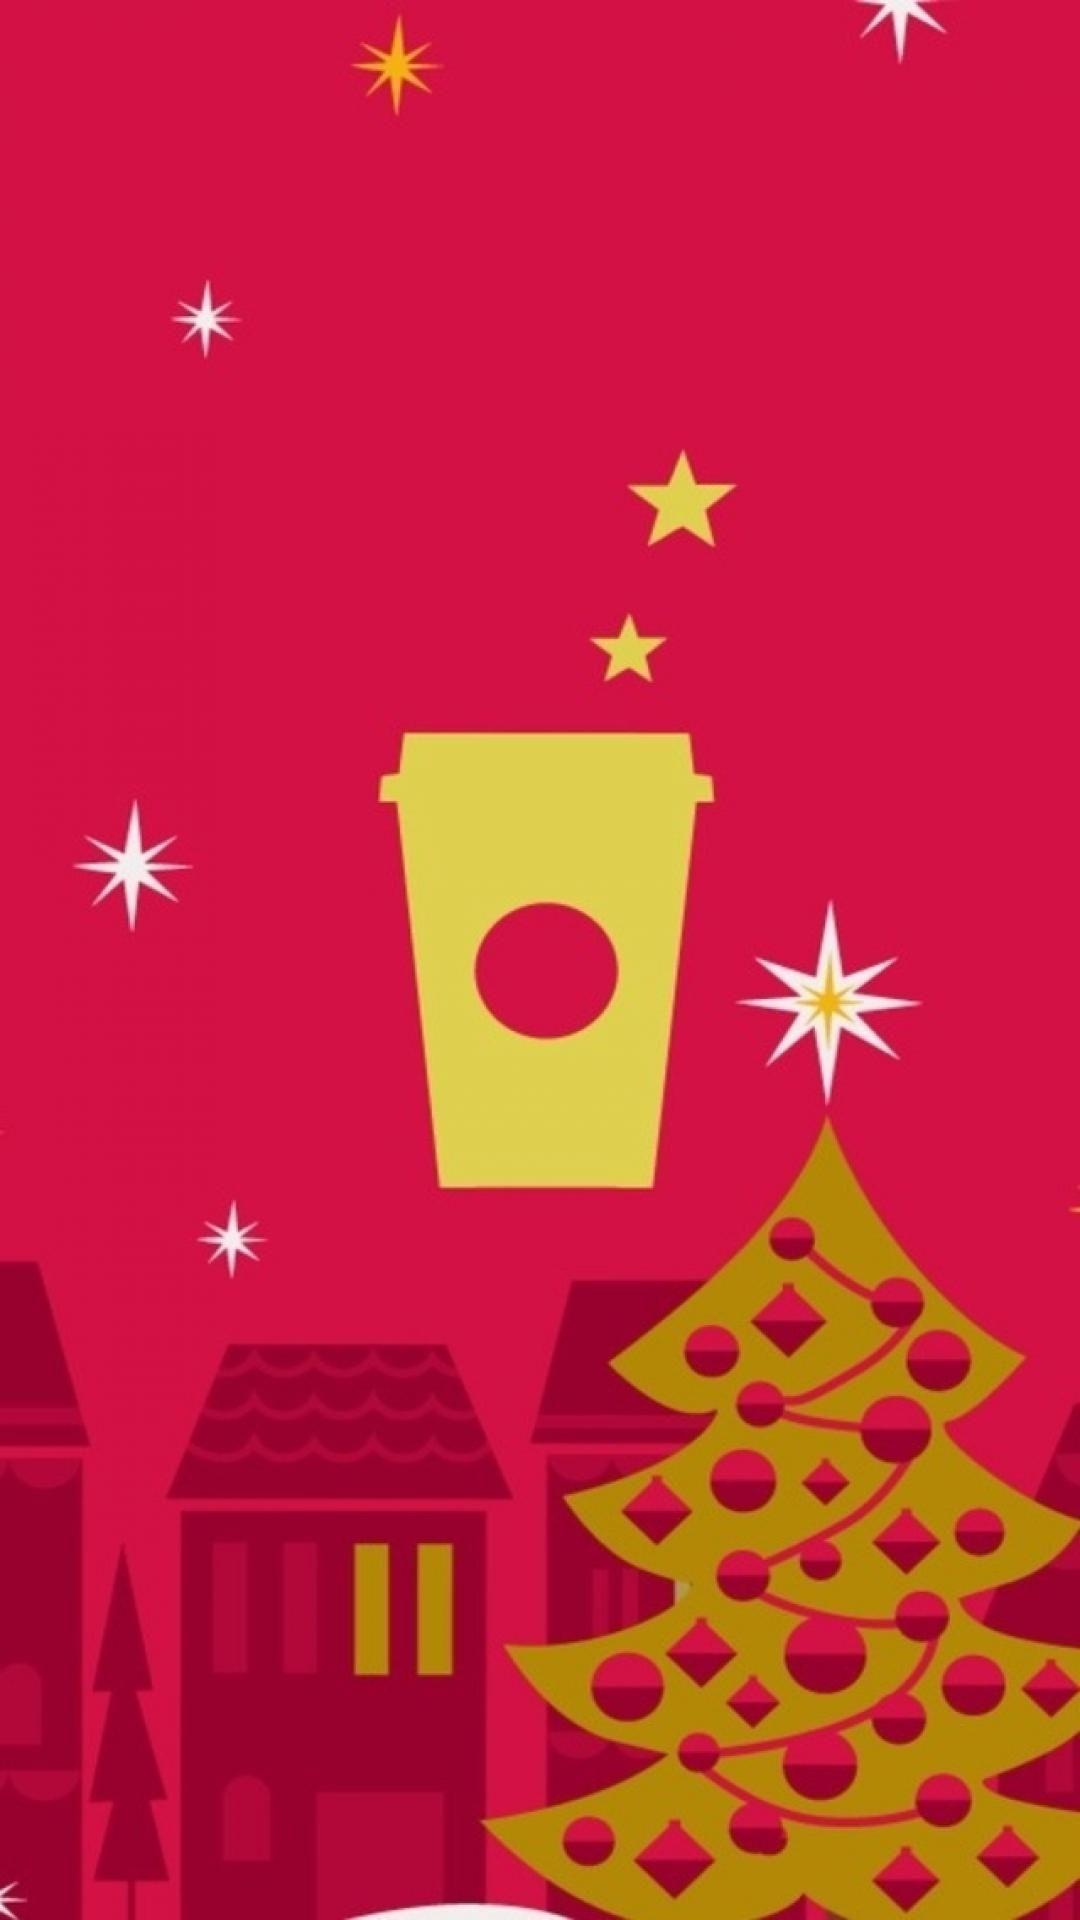 Starbucks iPhone 7 wallpaper